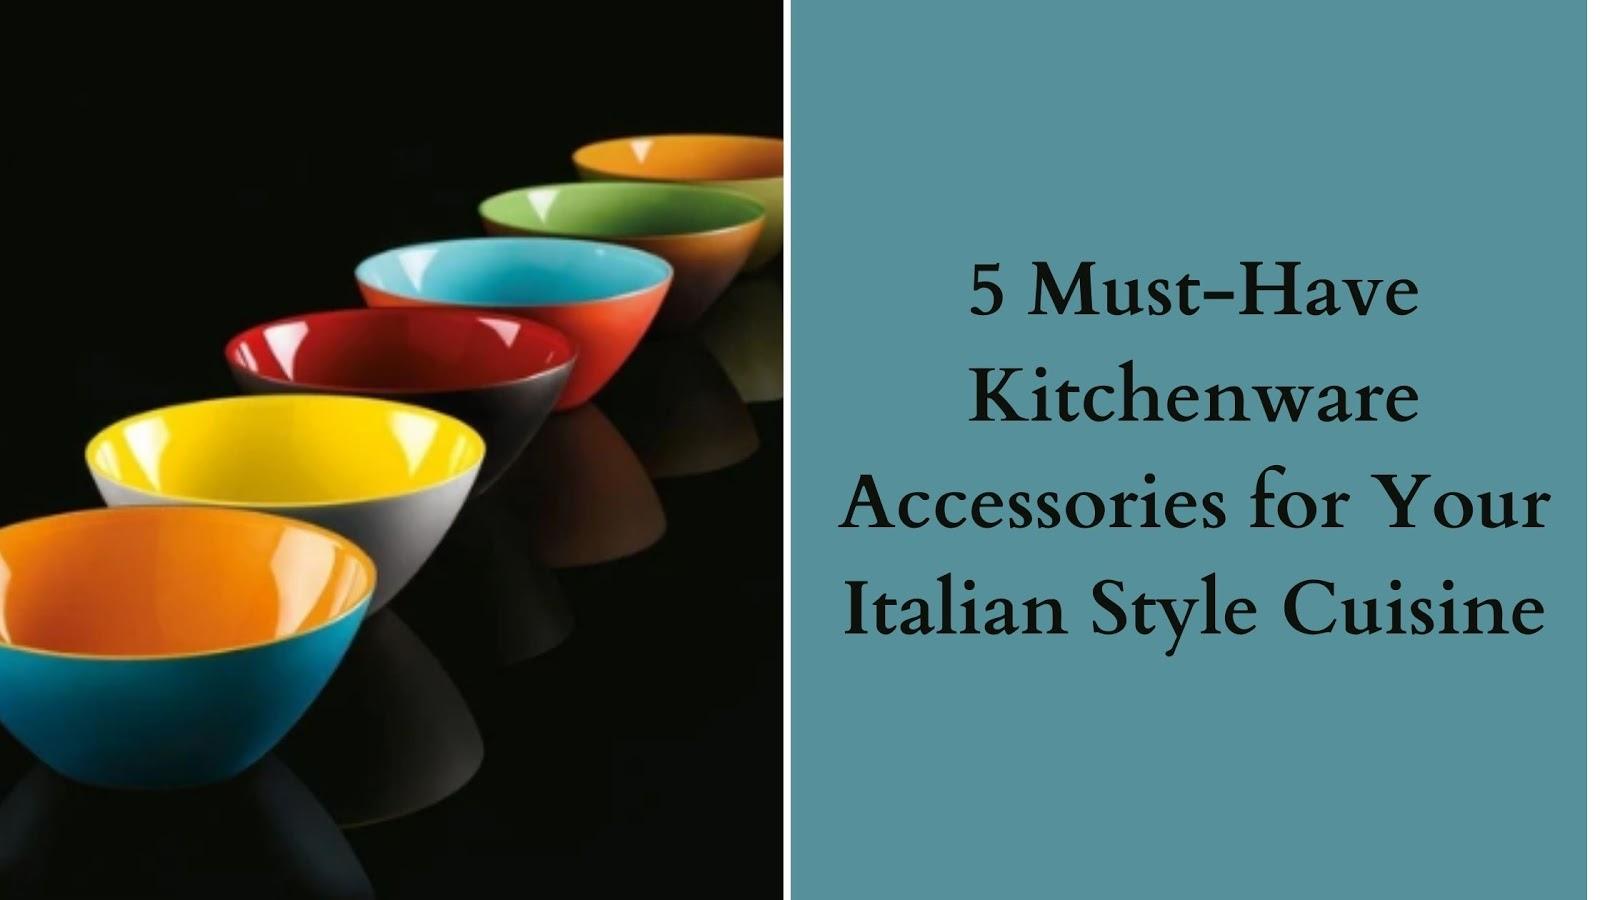 Italian Style Cuisine